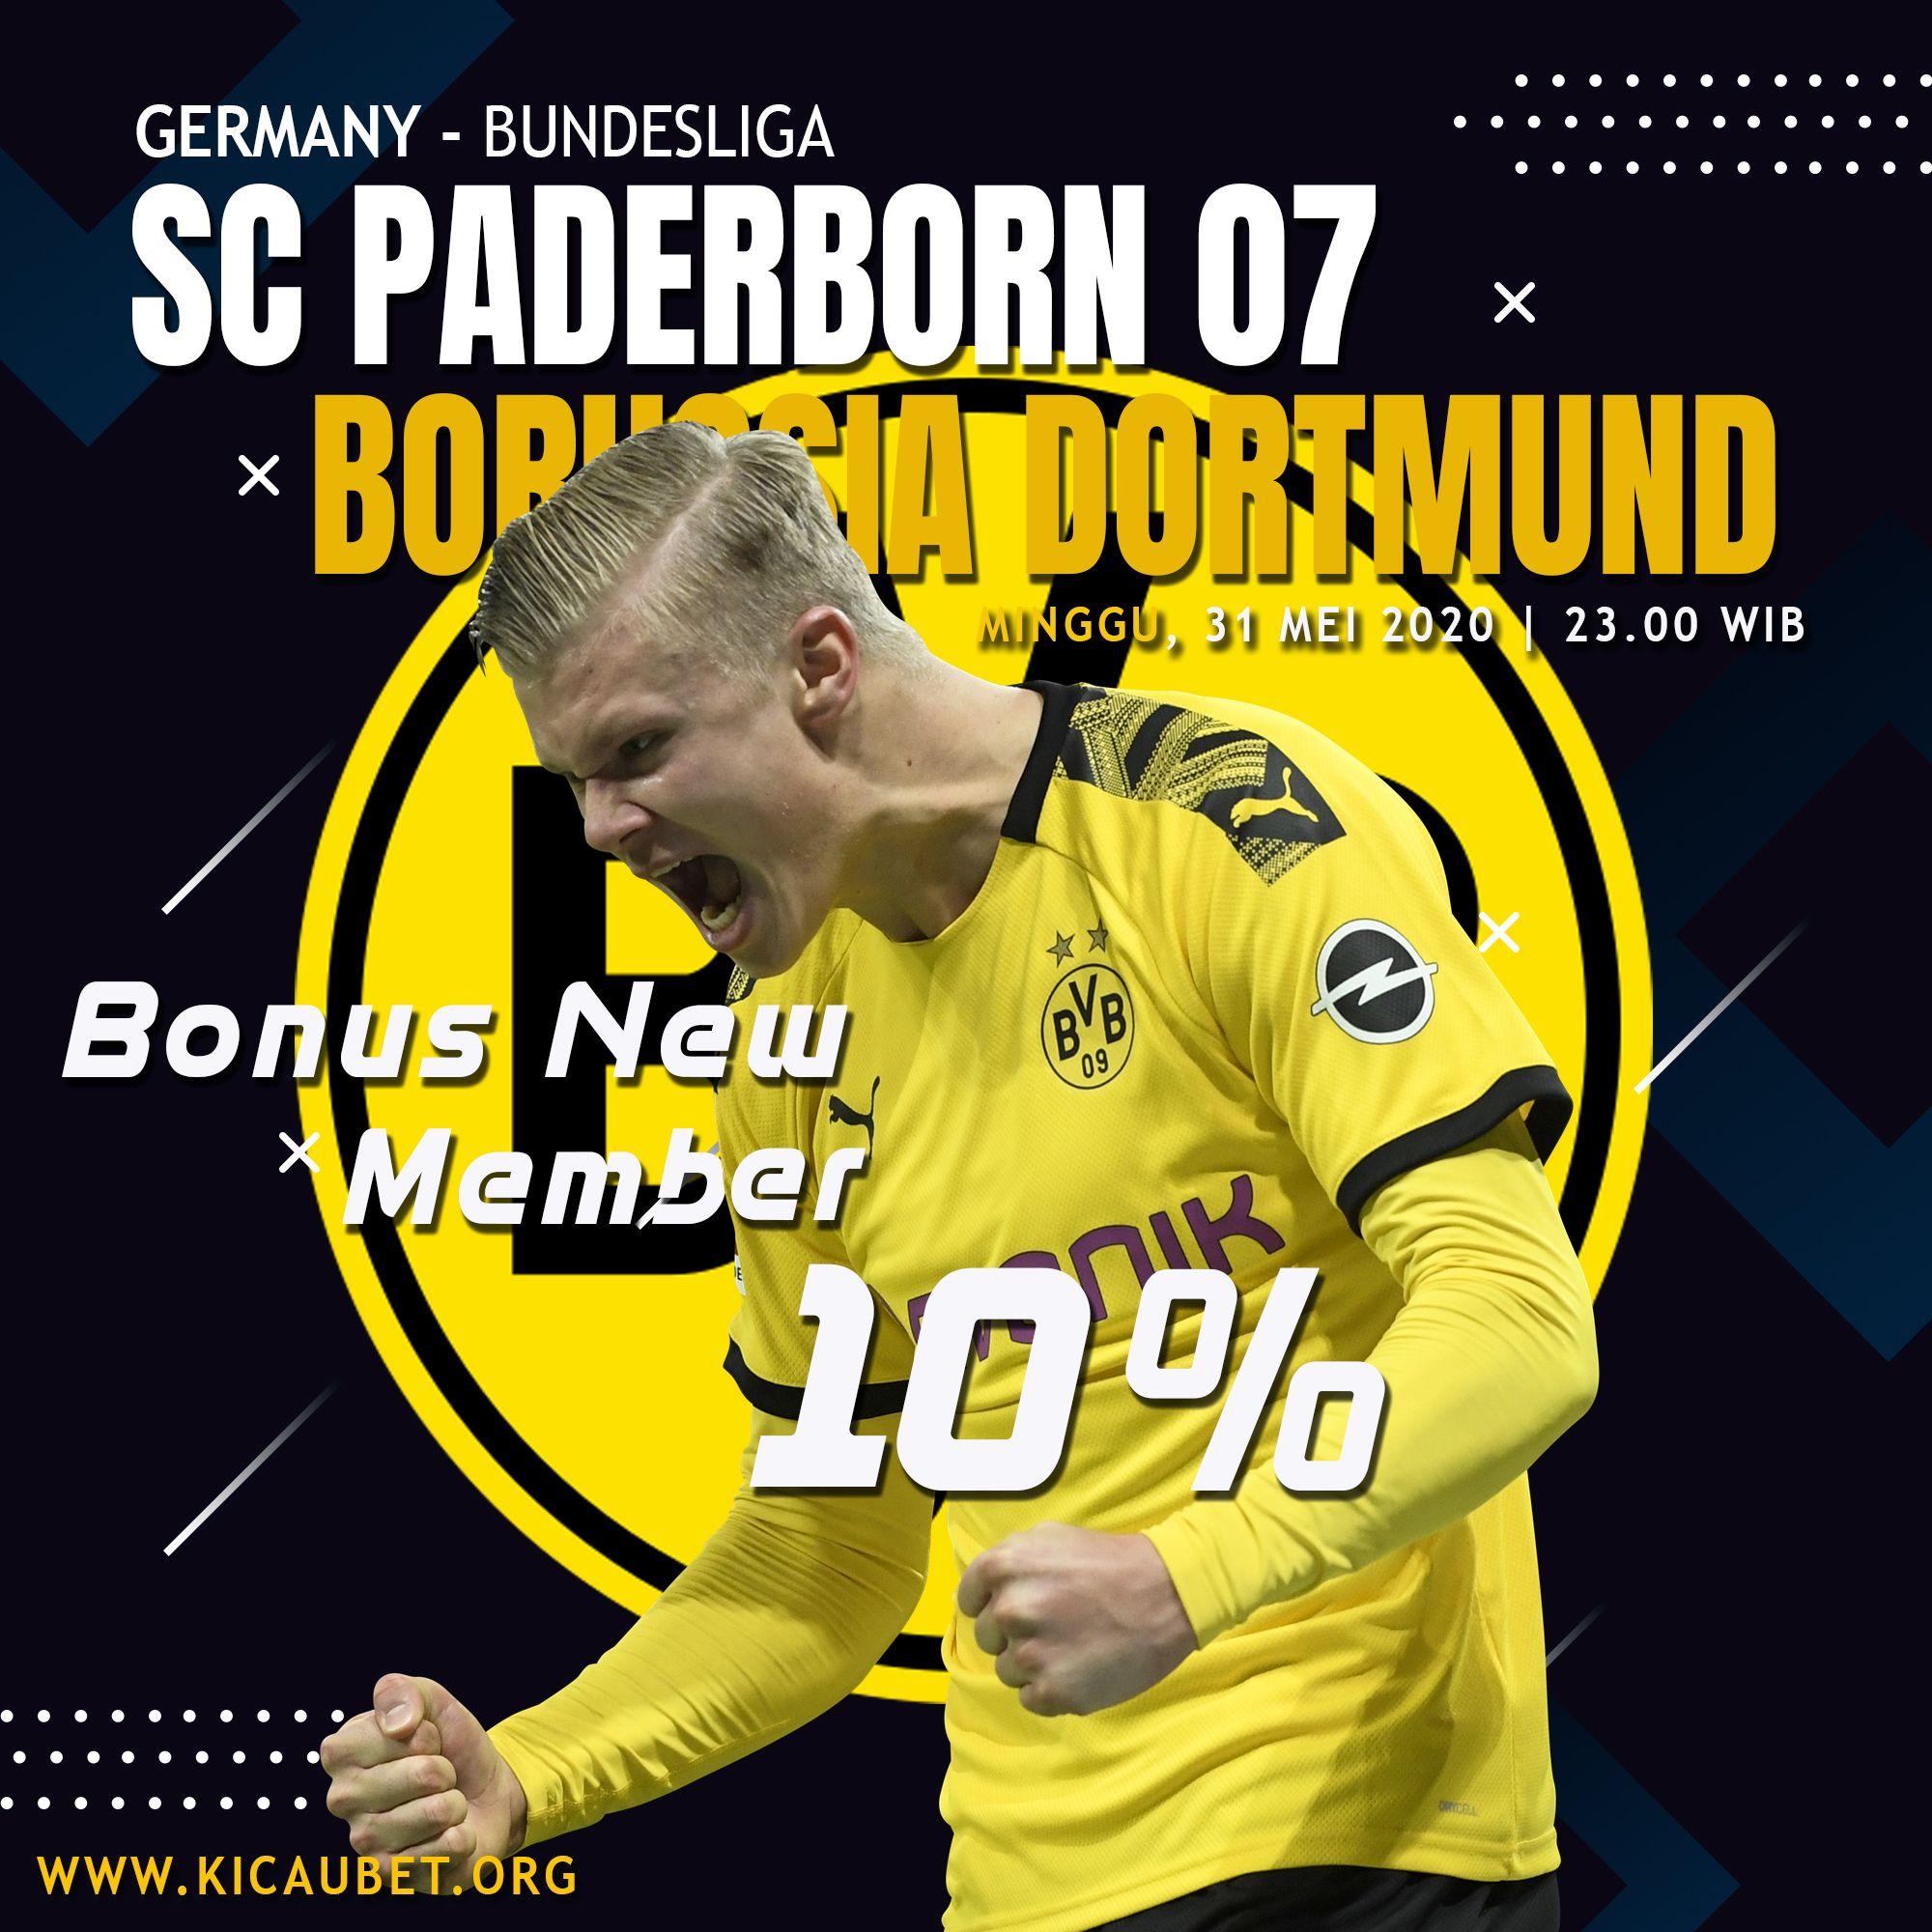 Sc Paderborn Borussia Dortmund